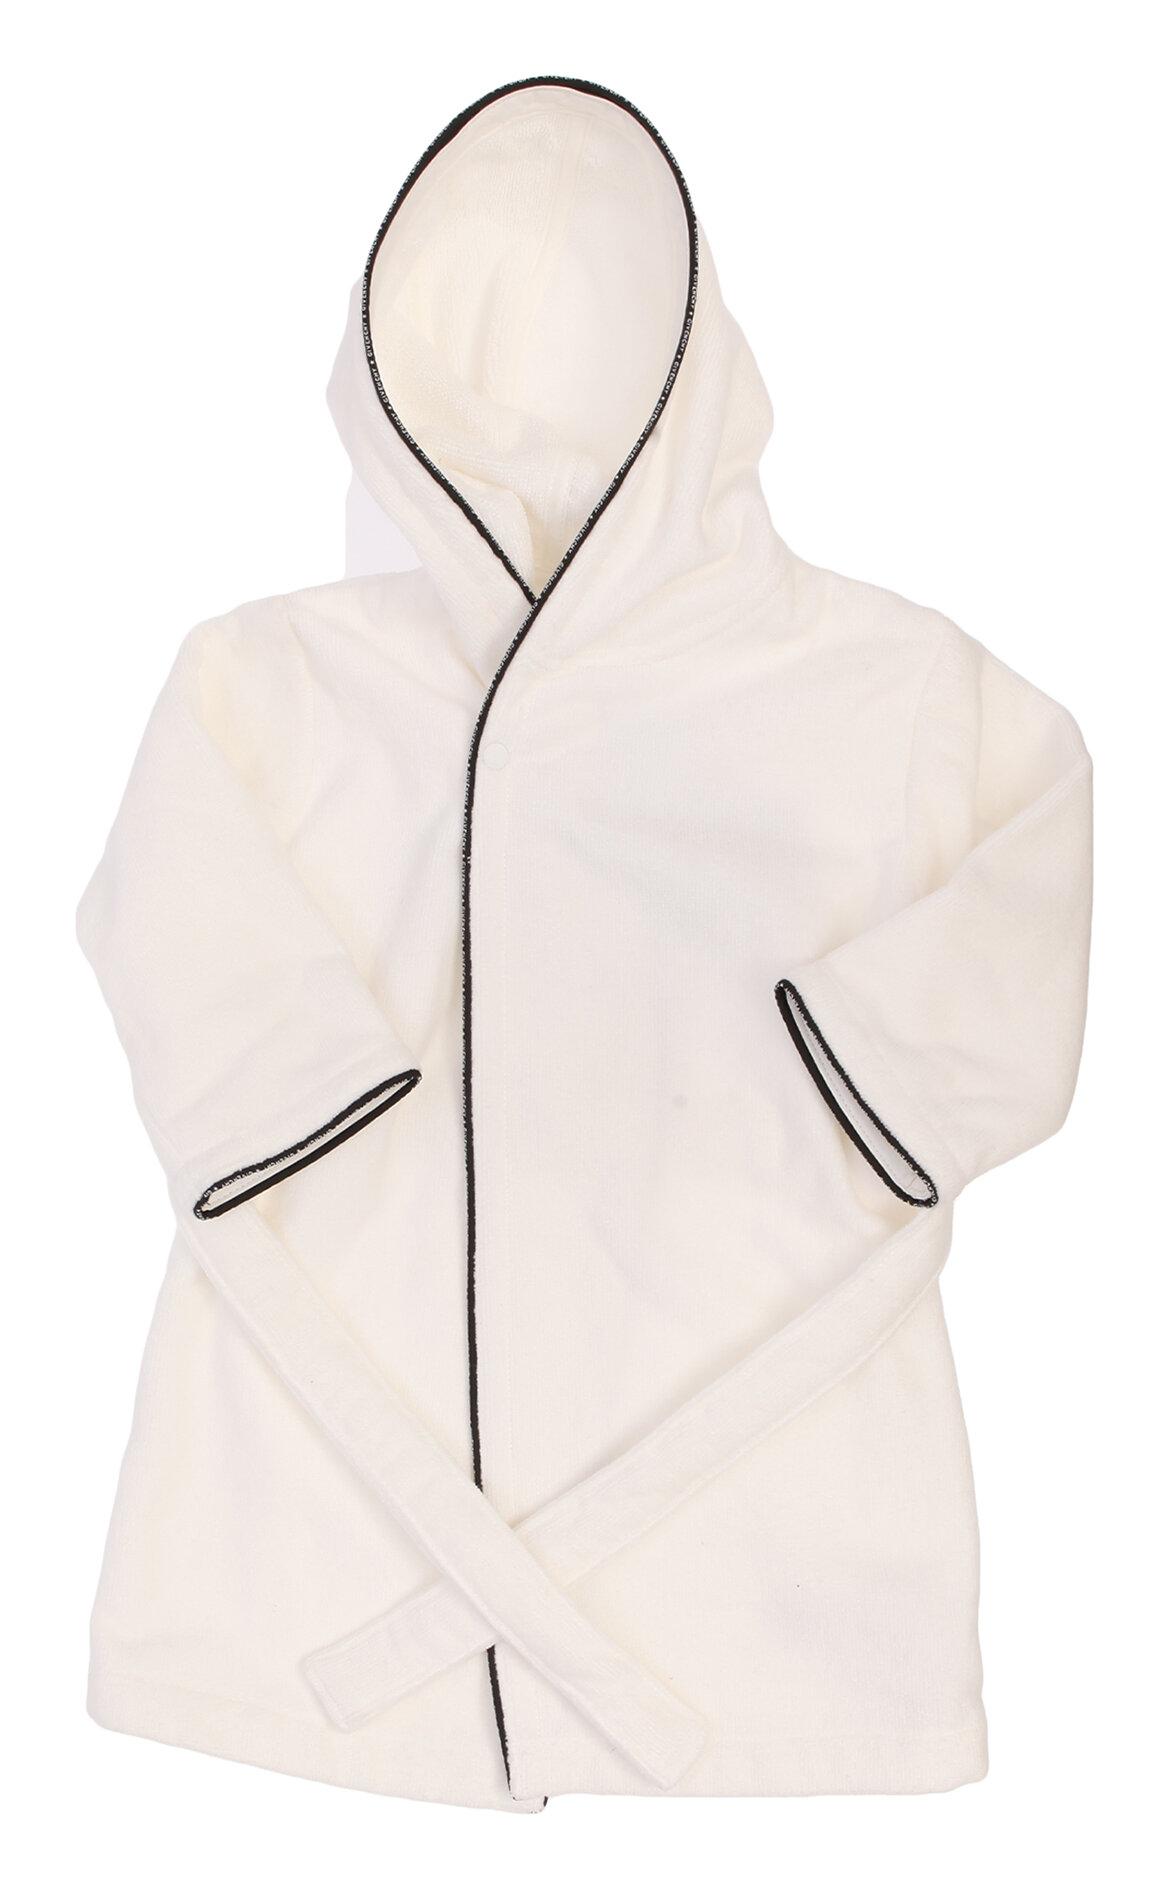 Givenchy-Givenchy Kapüşonlu Beyaz Bornoz